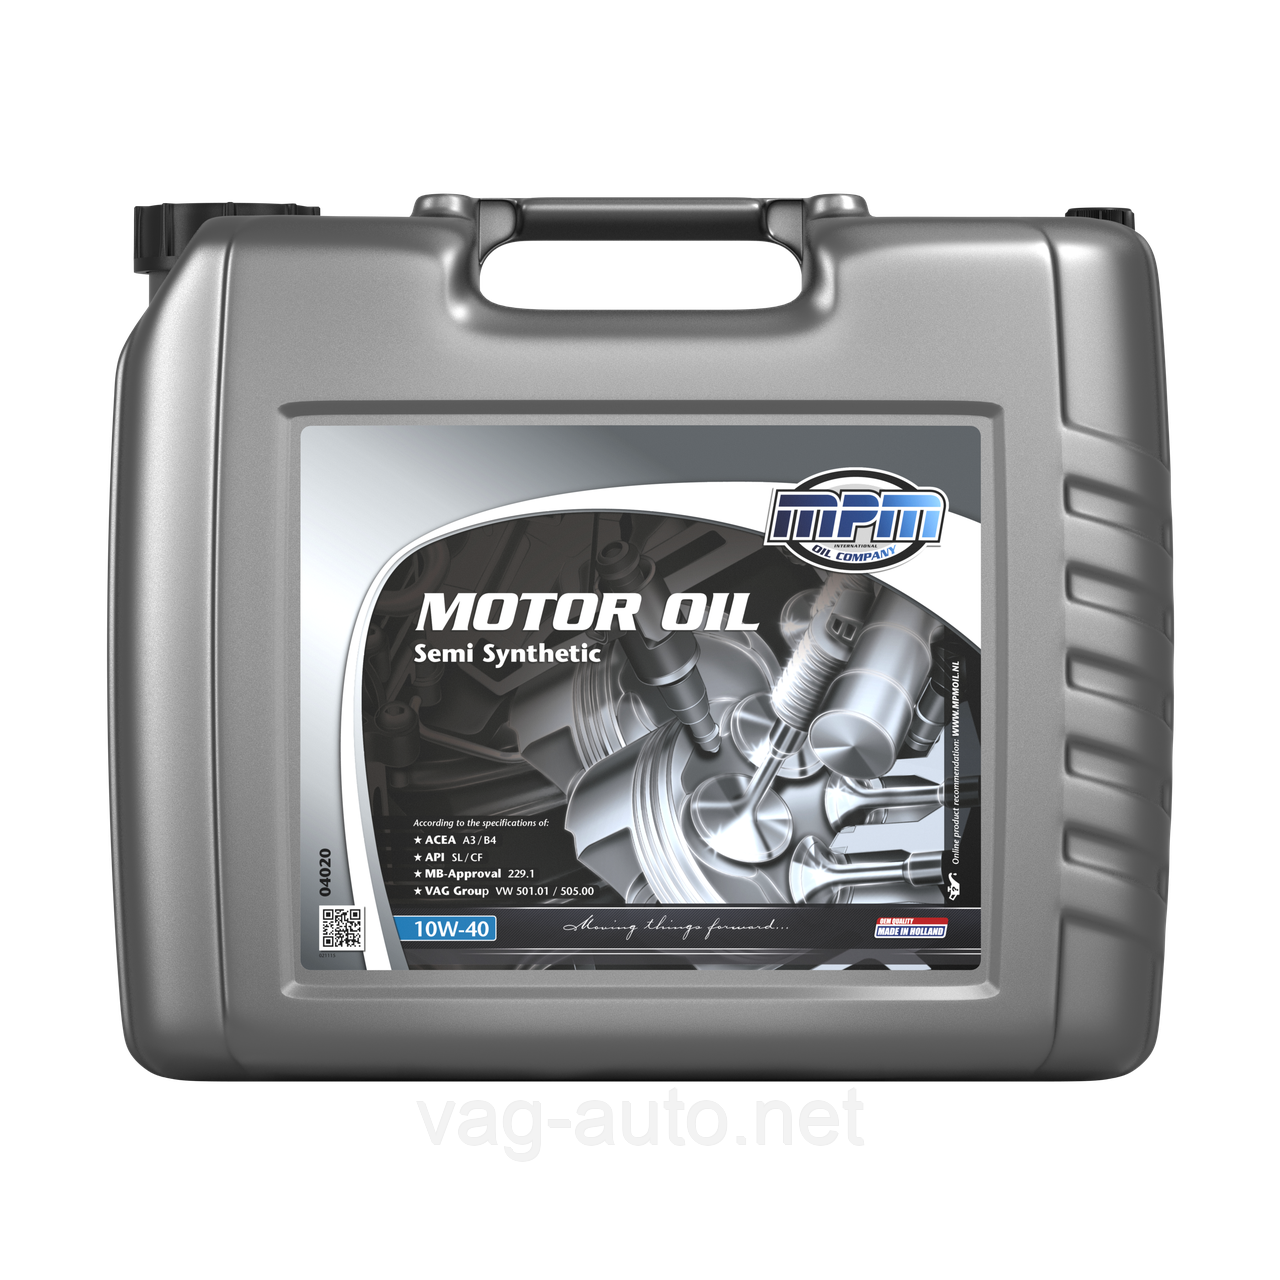 Моторне мастило MPM Motoroil 10W-40 Semi Synthetic 20L